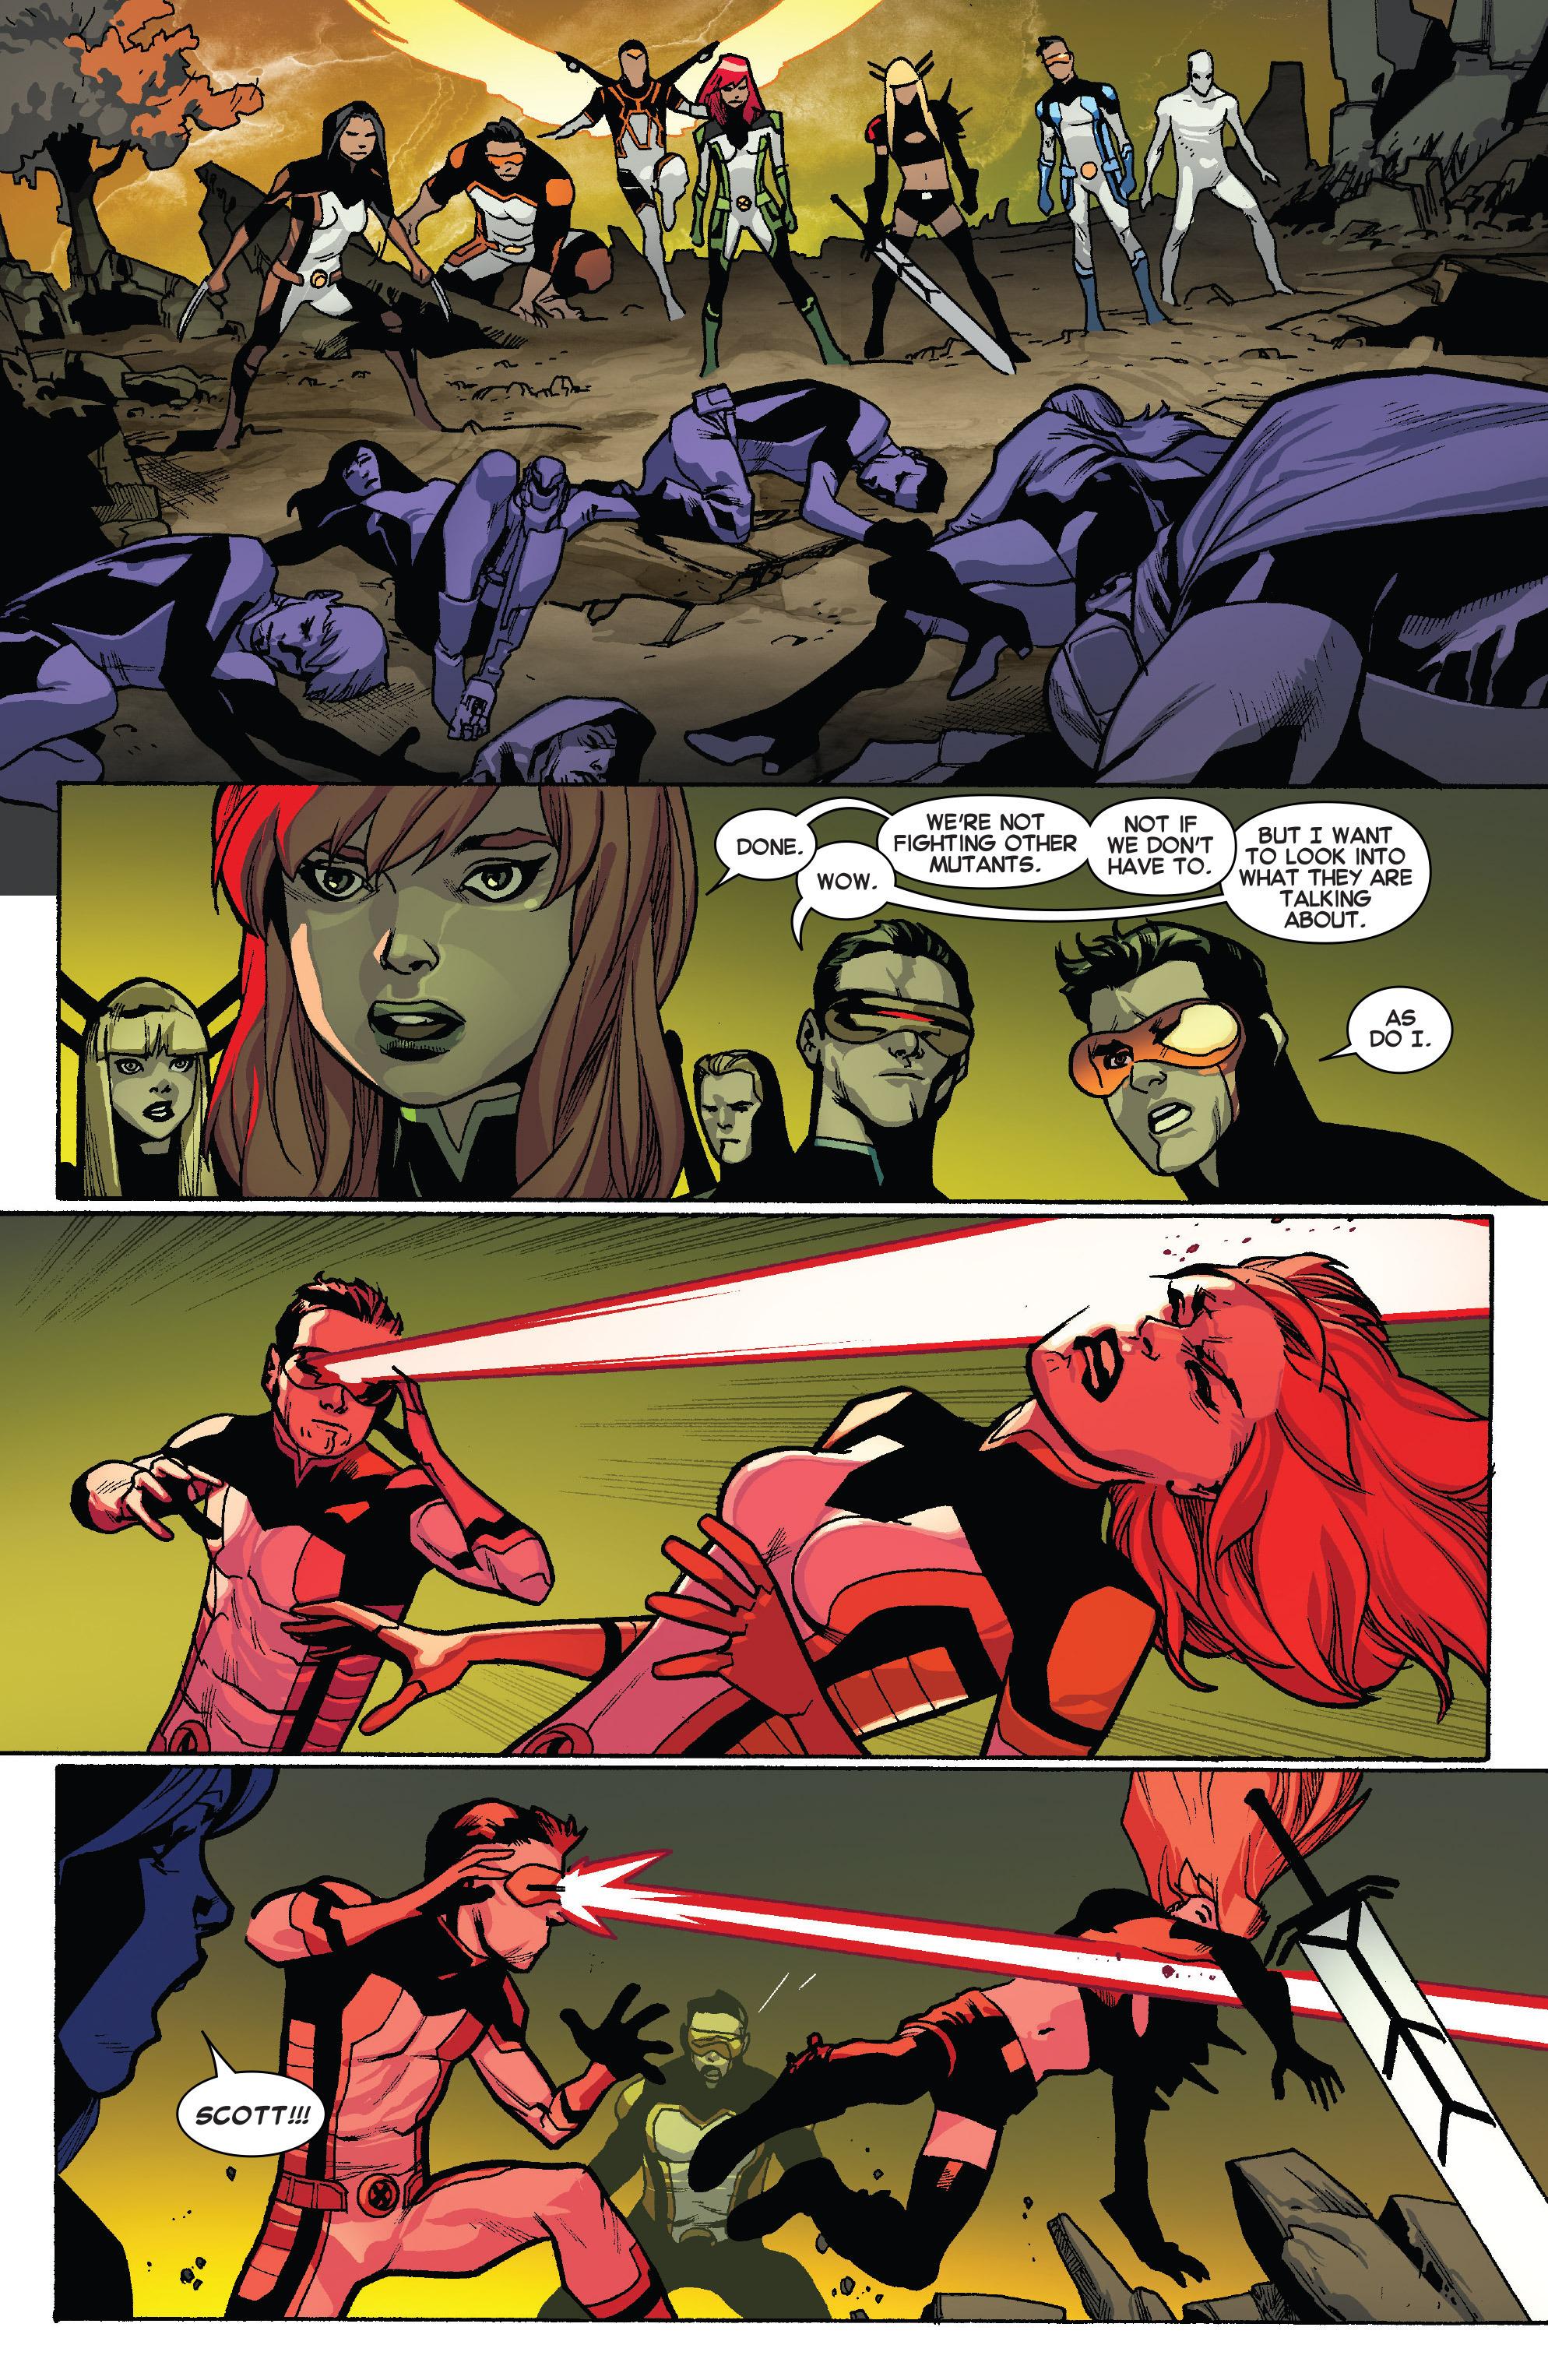 All-New X-Men (2013) chap 41 pic 10